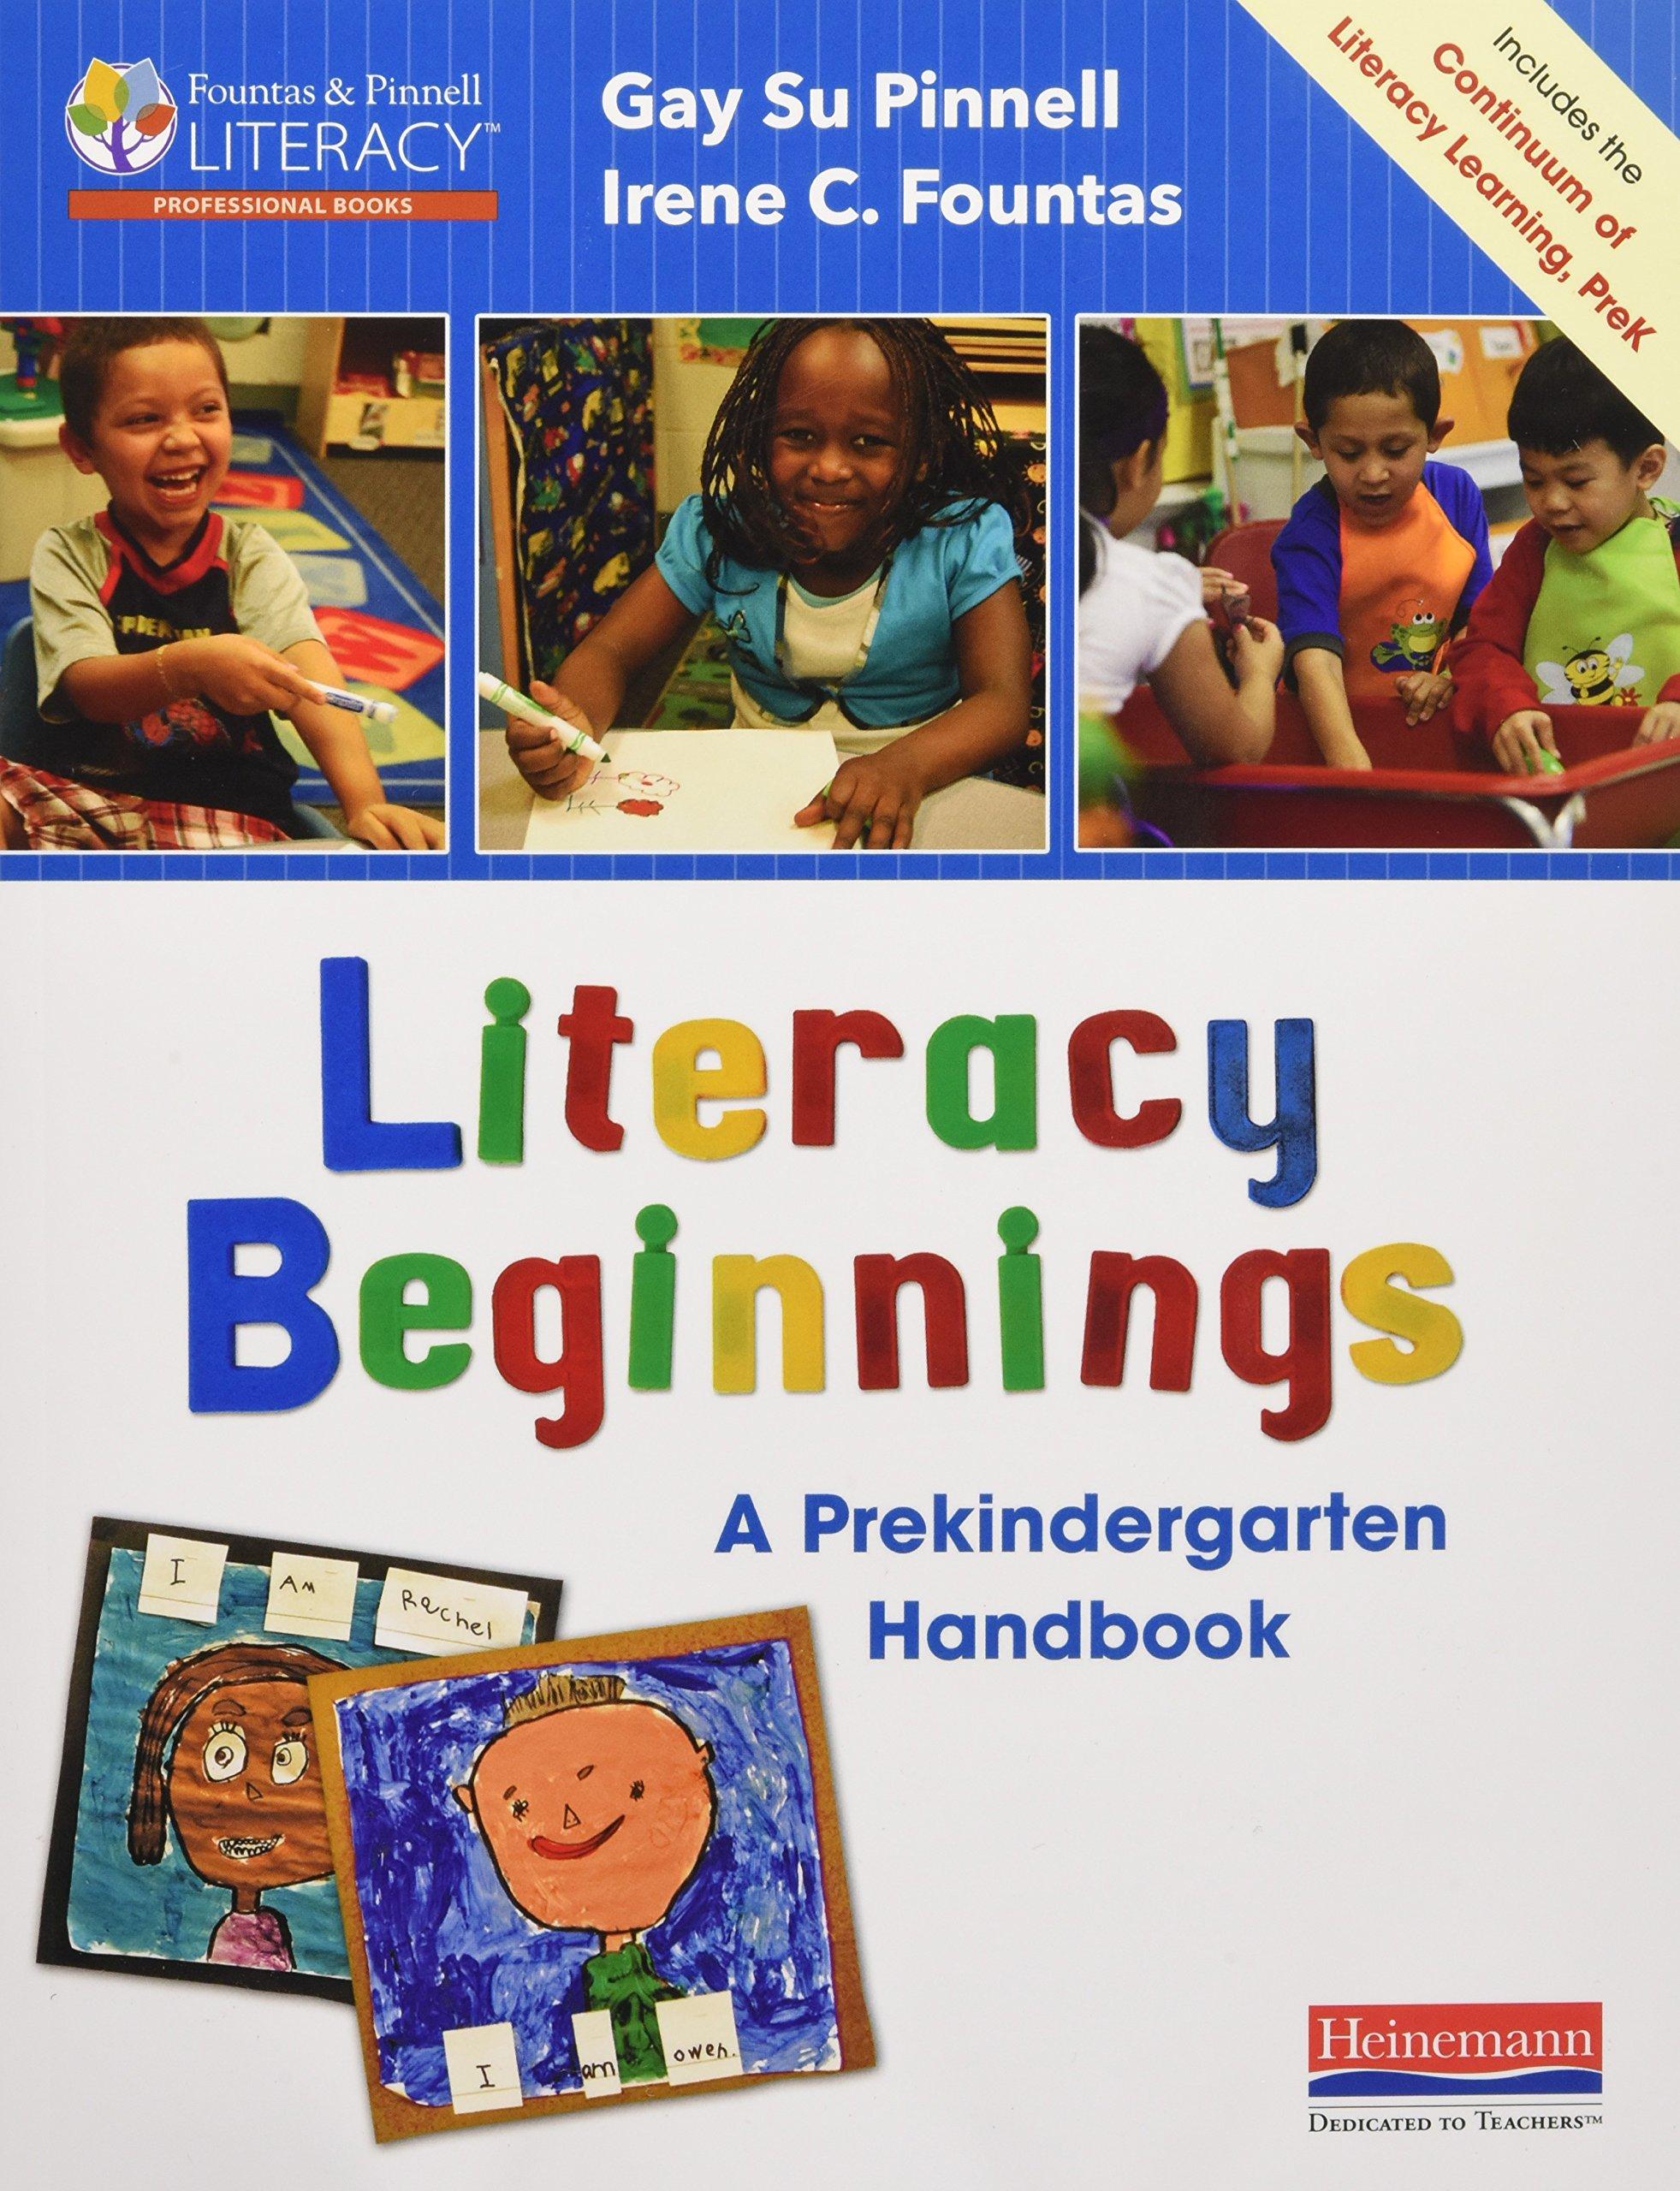 Literacy Beginnings: A Prekindergarten Handbook Paperback – Mar 1 2011